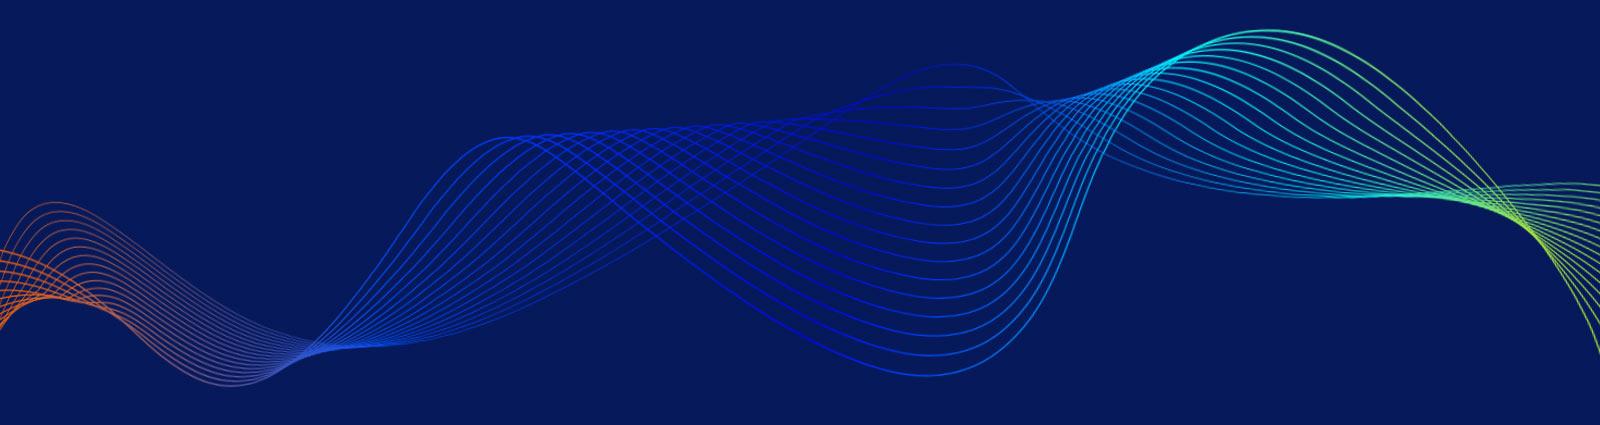 New York NYIIX Peering Exchange Abstract Lines Graphic